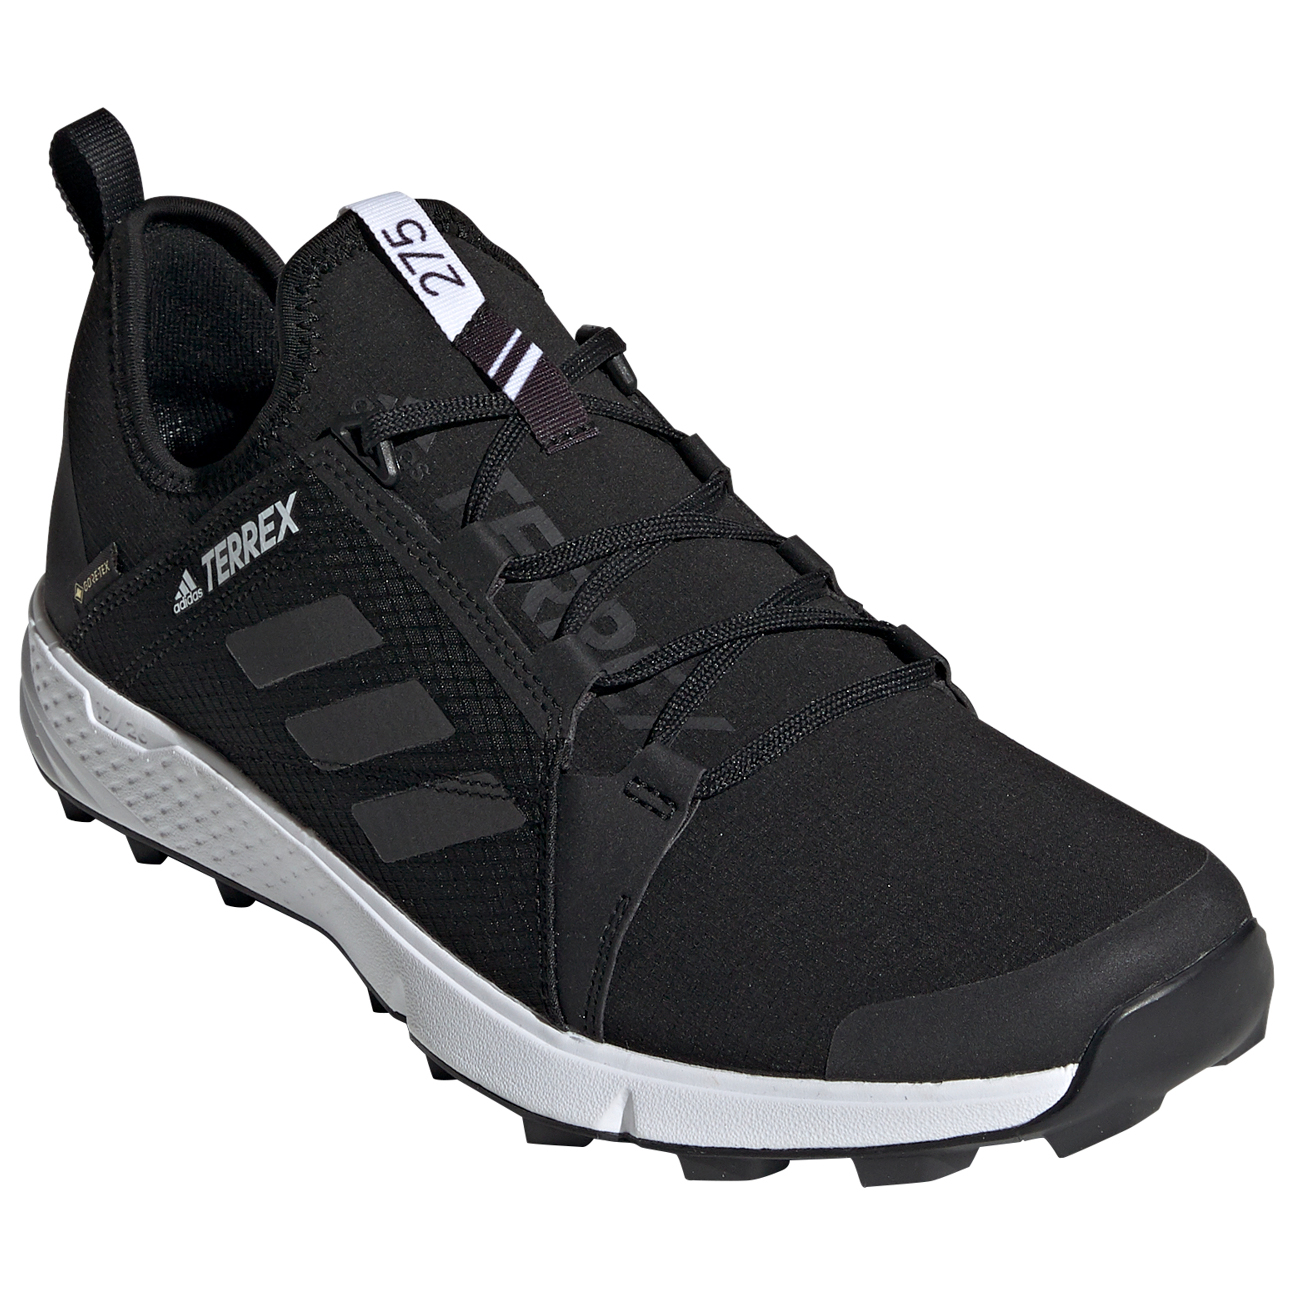 Adidas Terrex Agravic Speed Trailrunningschuhe Damen